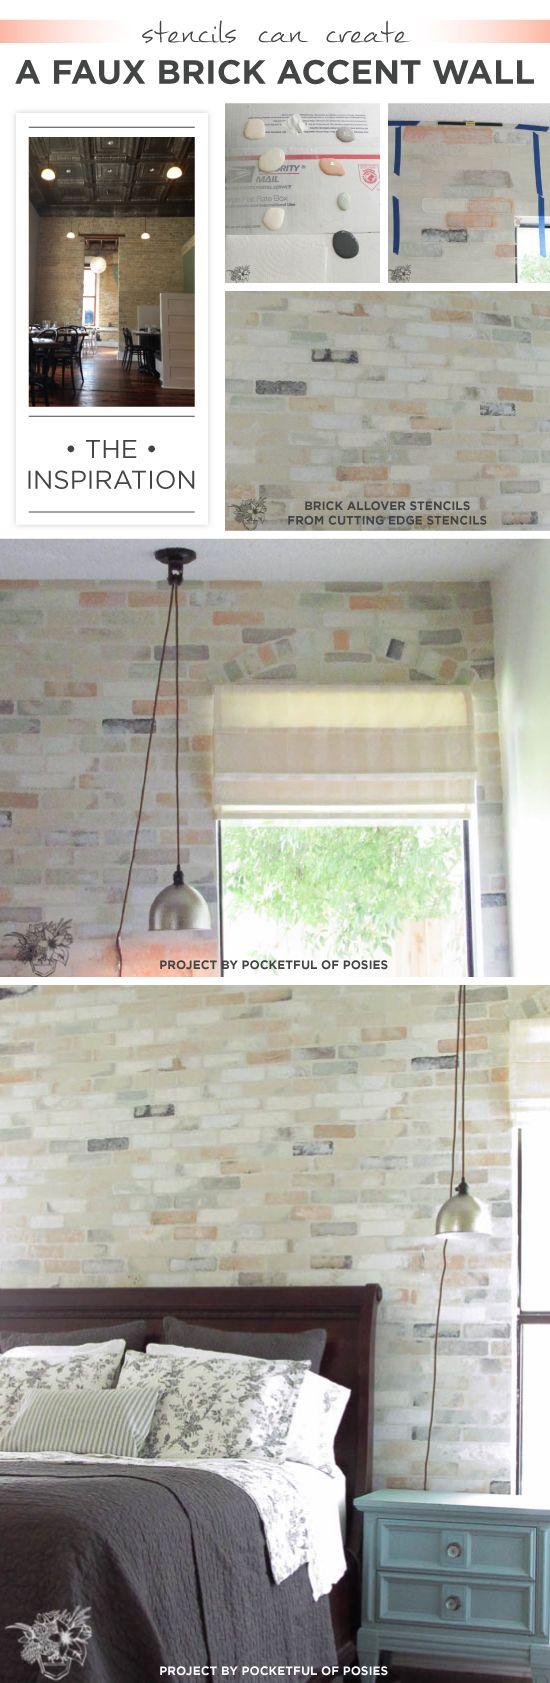 109 best stone design ideas images on pinterest brick for Faux brick edging